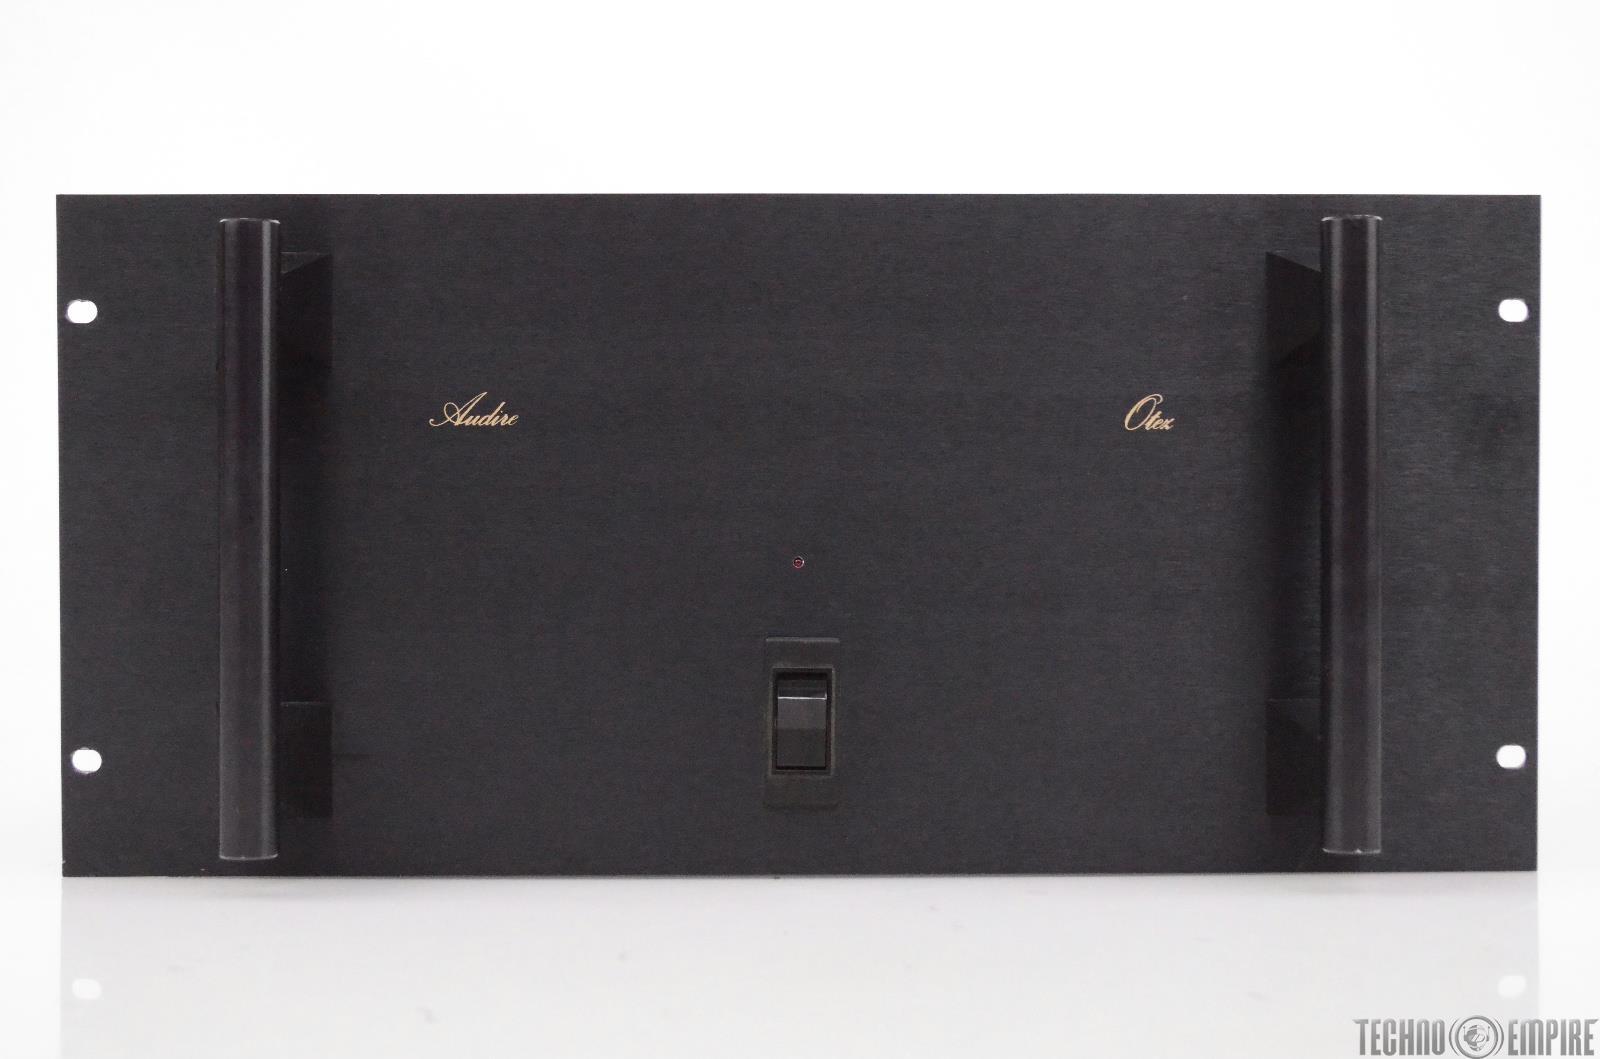 Audire Otez Stereo Power Amplifier 1750 Watt 2 Channel Audiophile Amp #31158